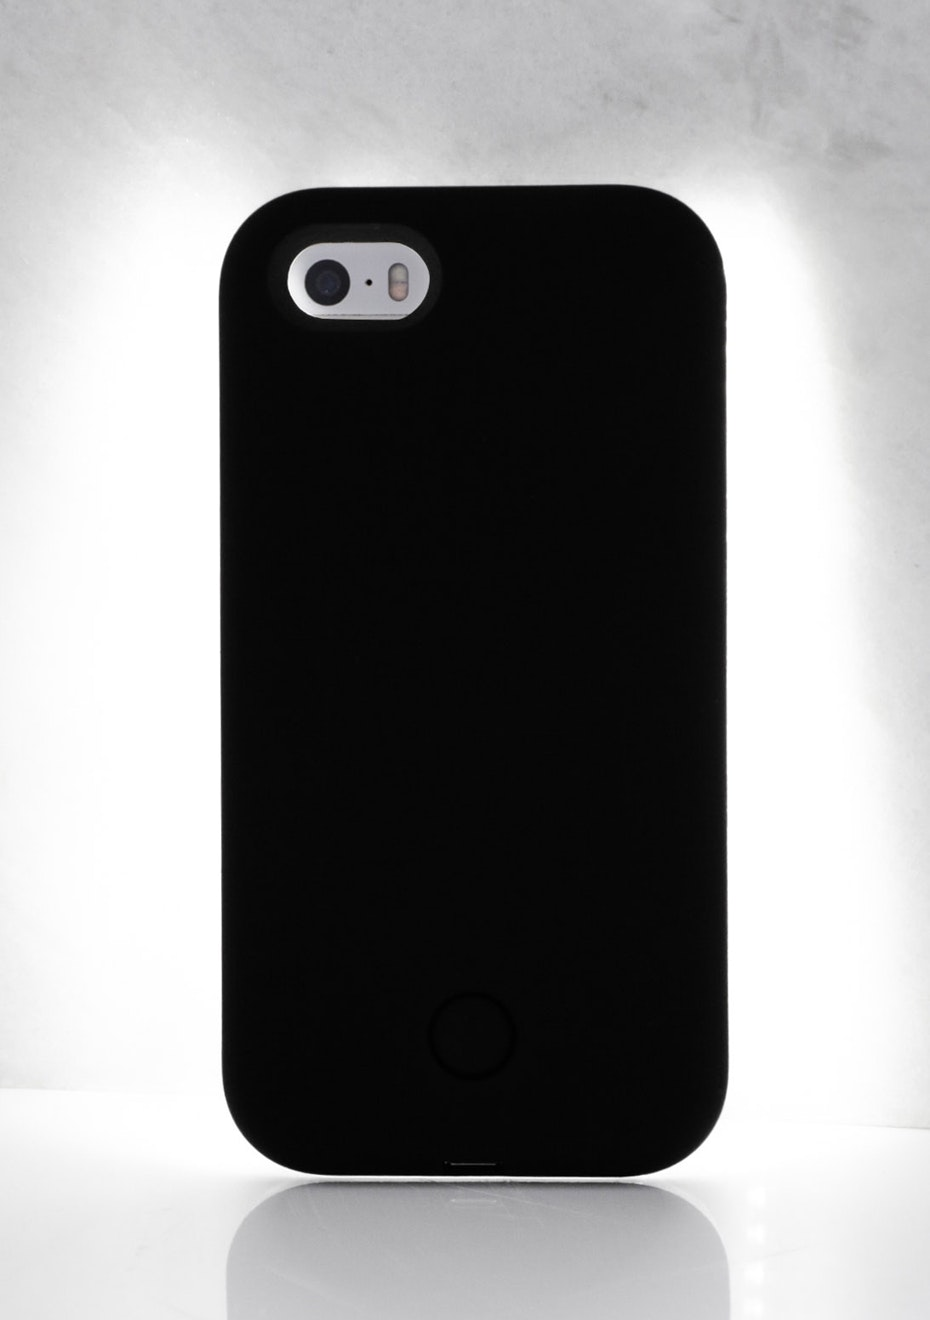 IPHONE 5/5S LIGHT CASE - Black